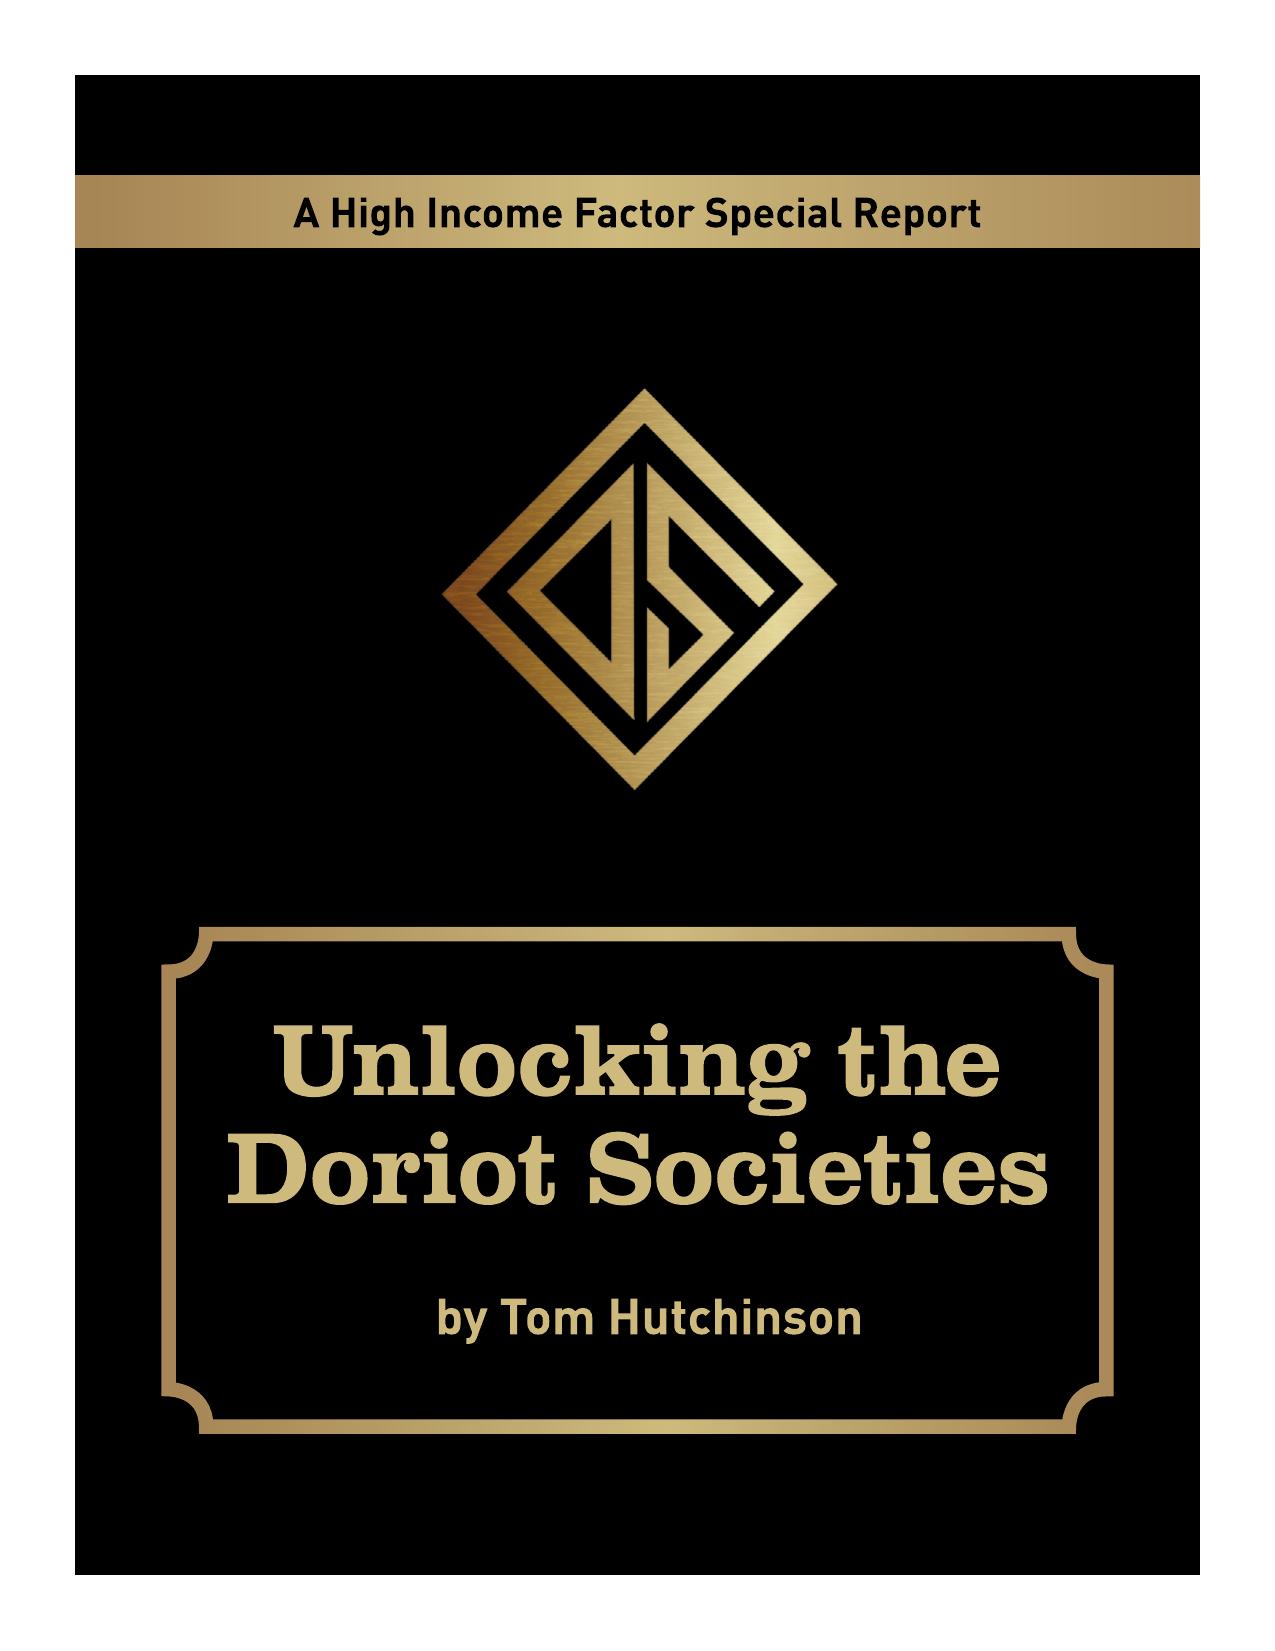 doriot societies investments for beginners